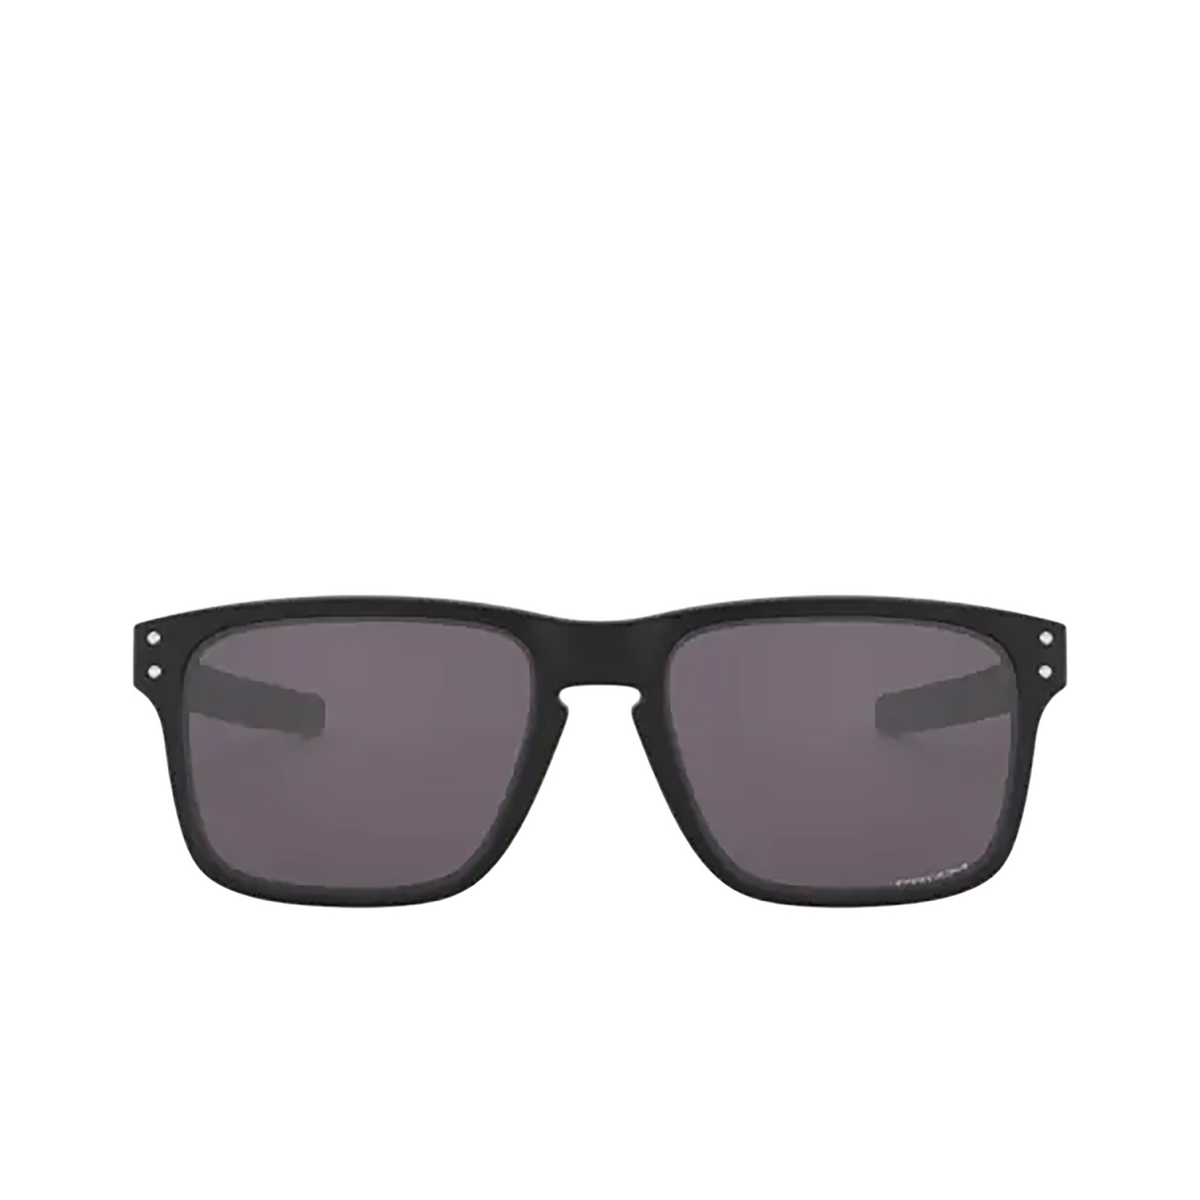 Oakley® Rectangle Sunglasses: Holbrook Mix OO9384 color Matte Black 938418 - 1/3.